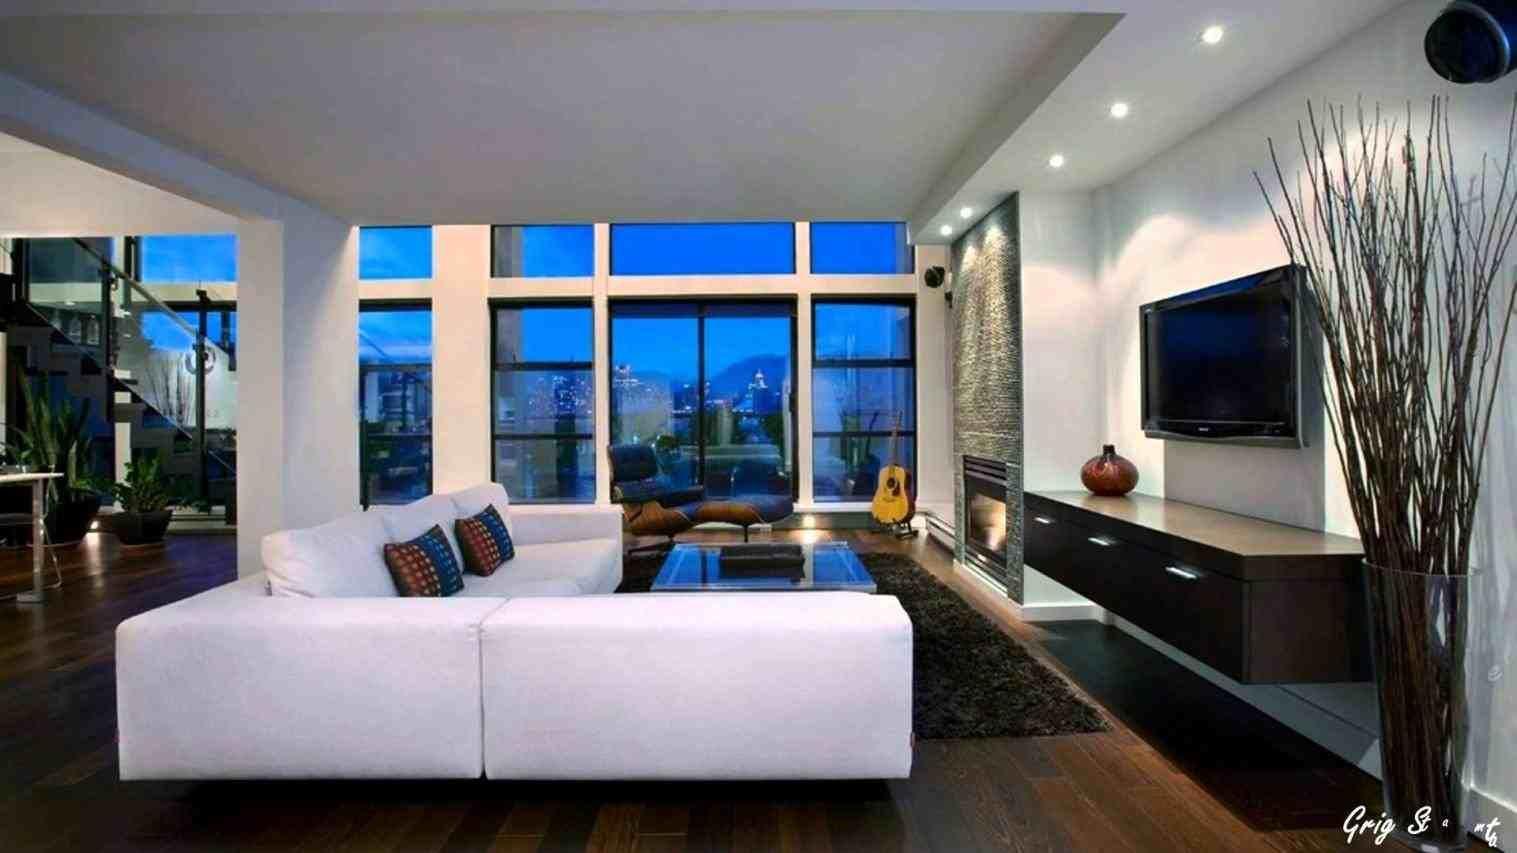 top view post interior design living room minimalist visit homelivings decor ideas also rh pinterest